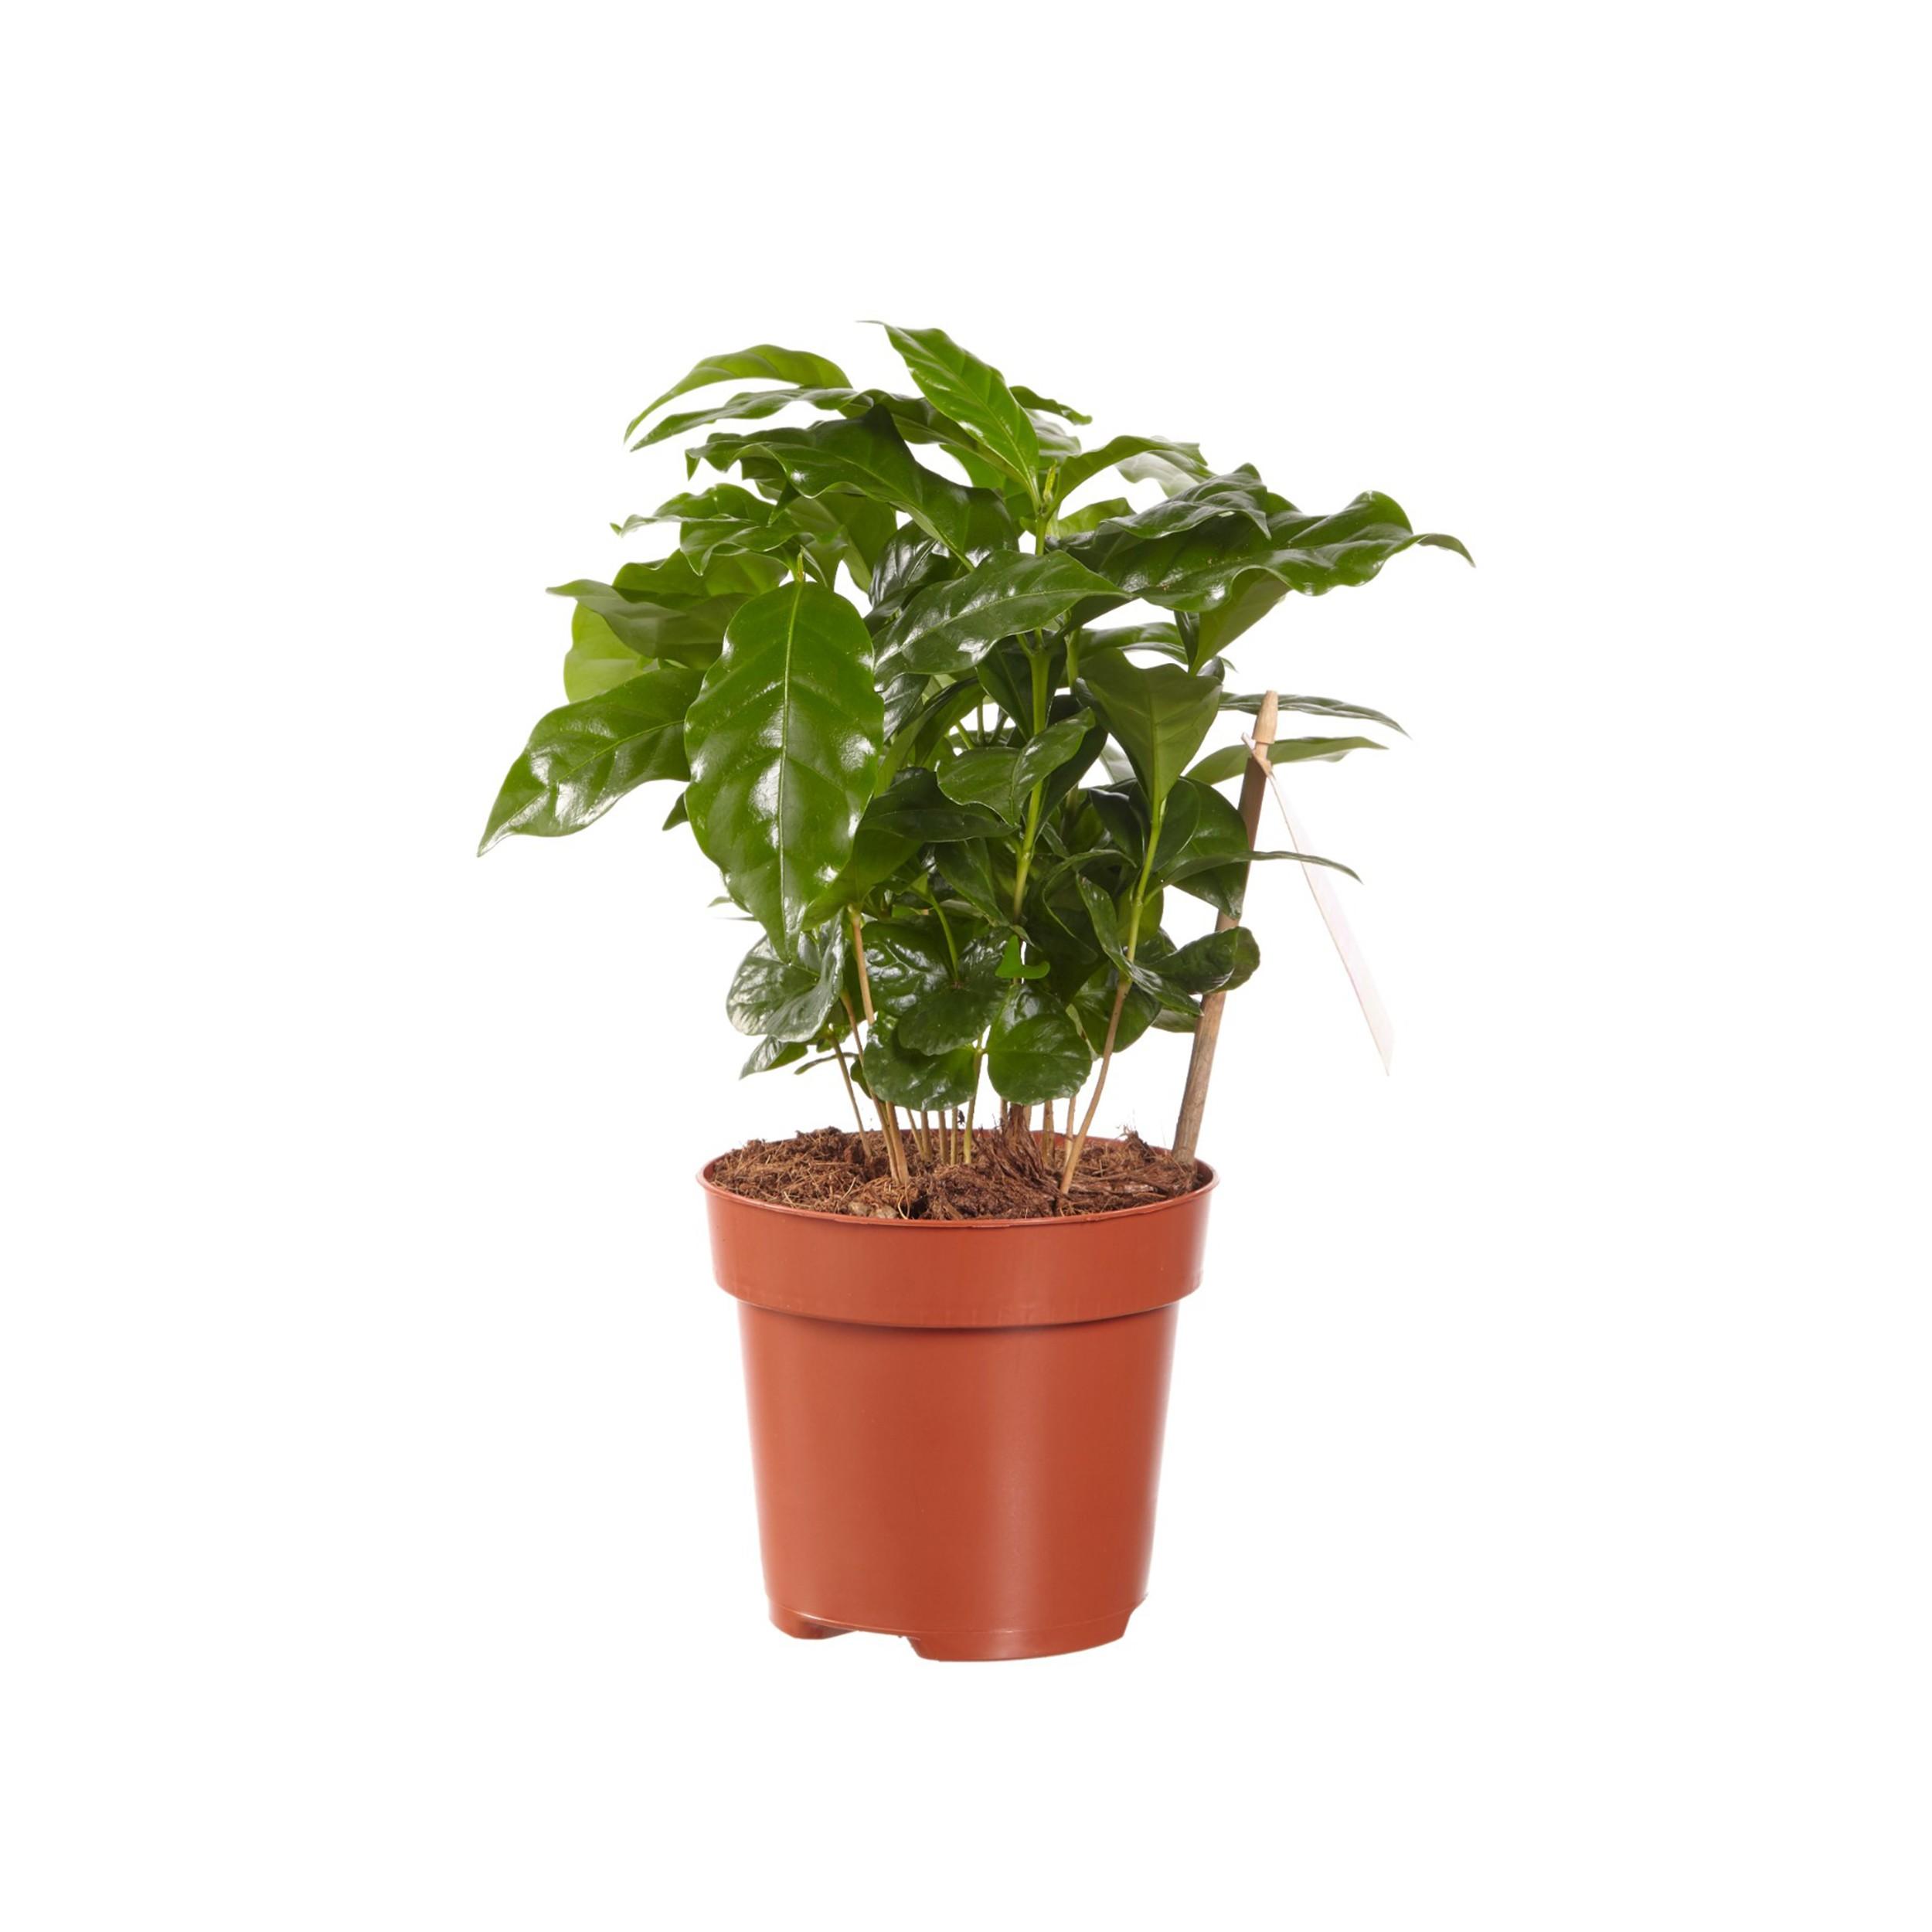 Zimmerpflanze Coffea arabica Kaffee Pflanze 1 Pflanze